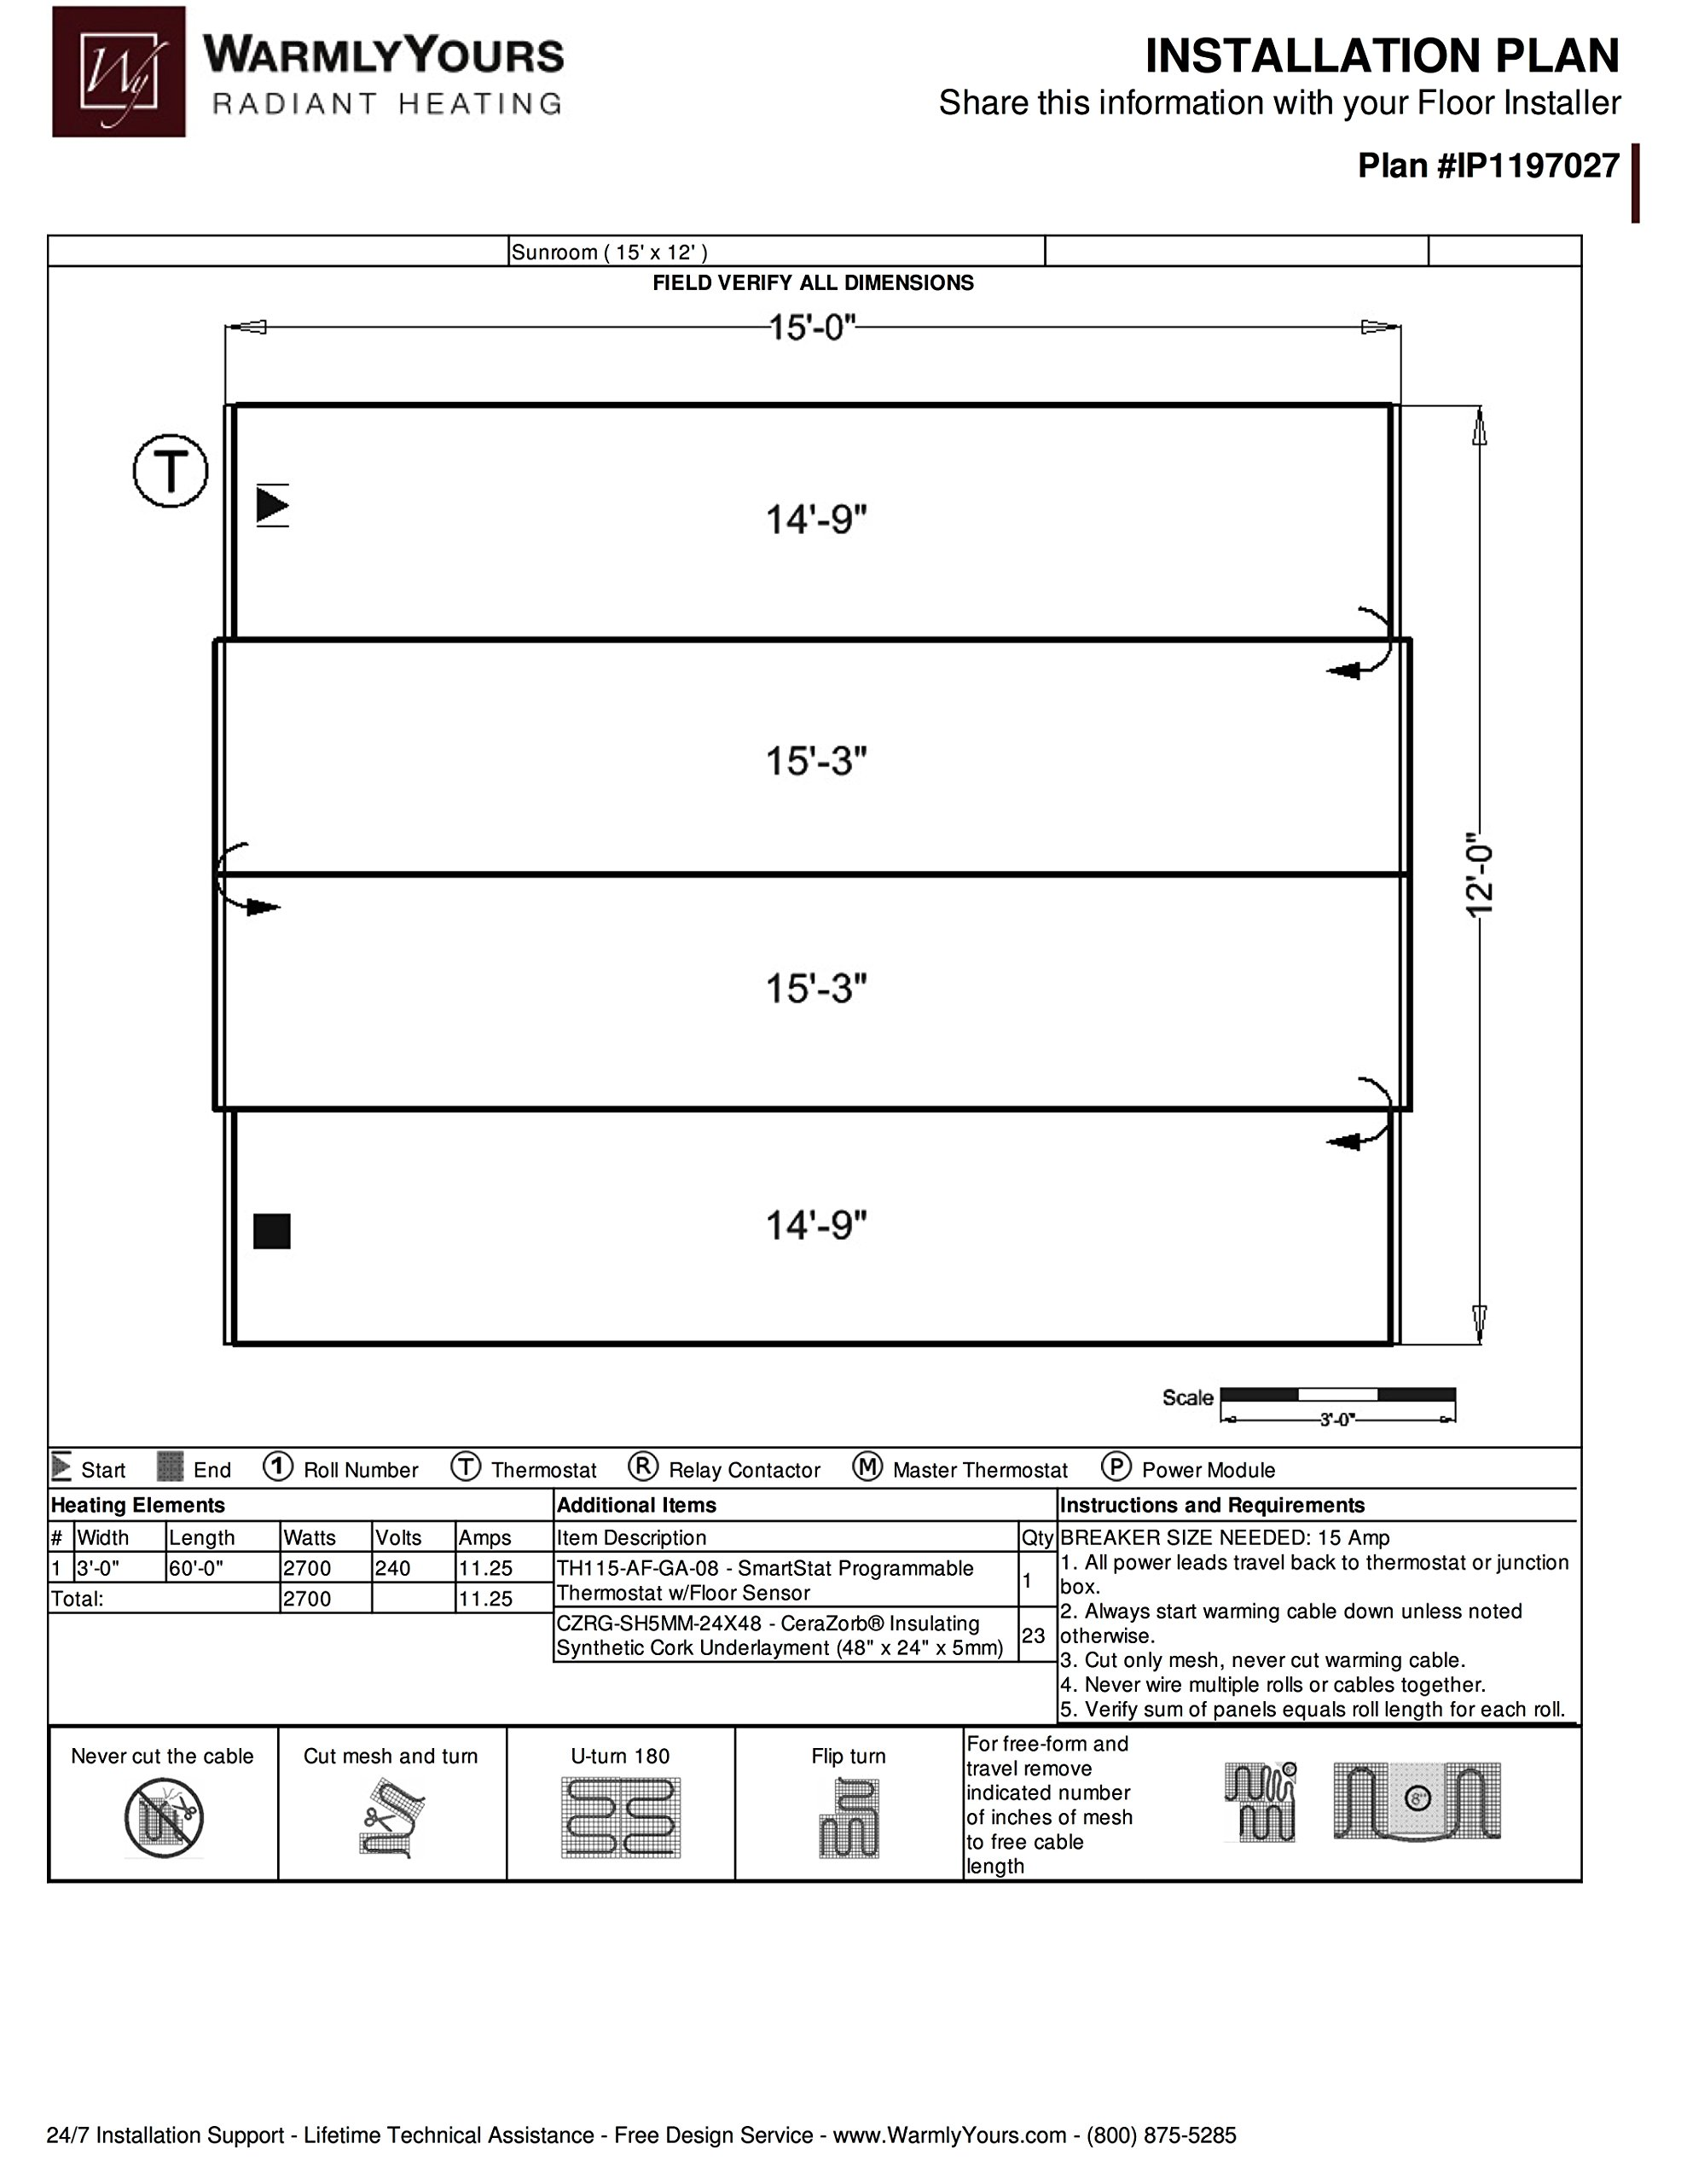 Warmly Yours TRT240-3.0x60 TempZone 240 V Twin Roll, 3' x 60' by WarmlyYours